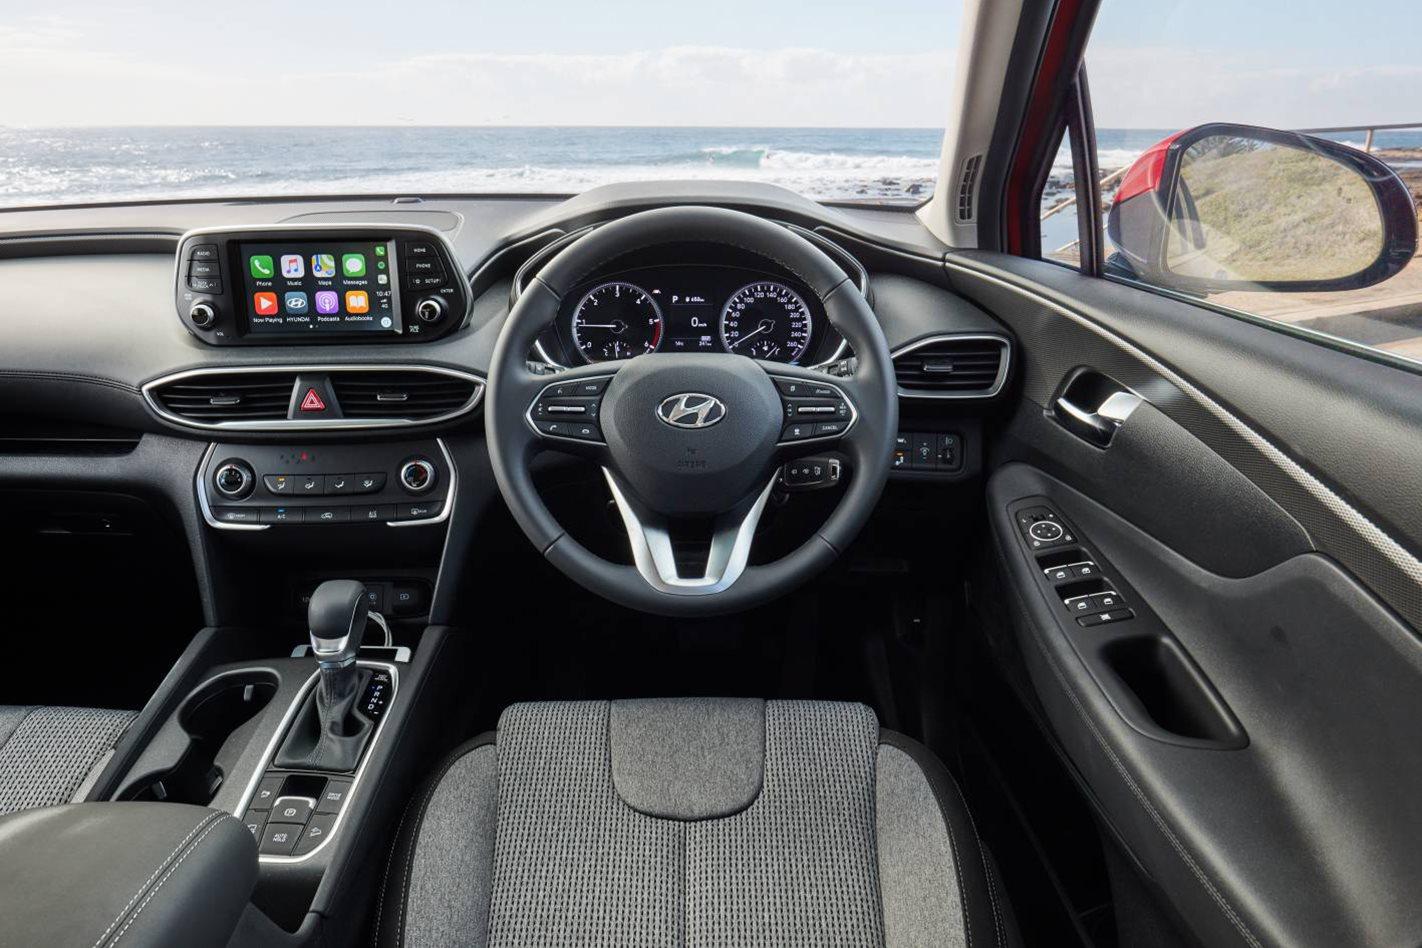 Hyundai Santa Fe 2020 Review Pricing Features